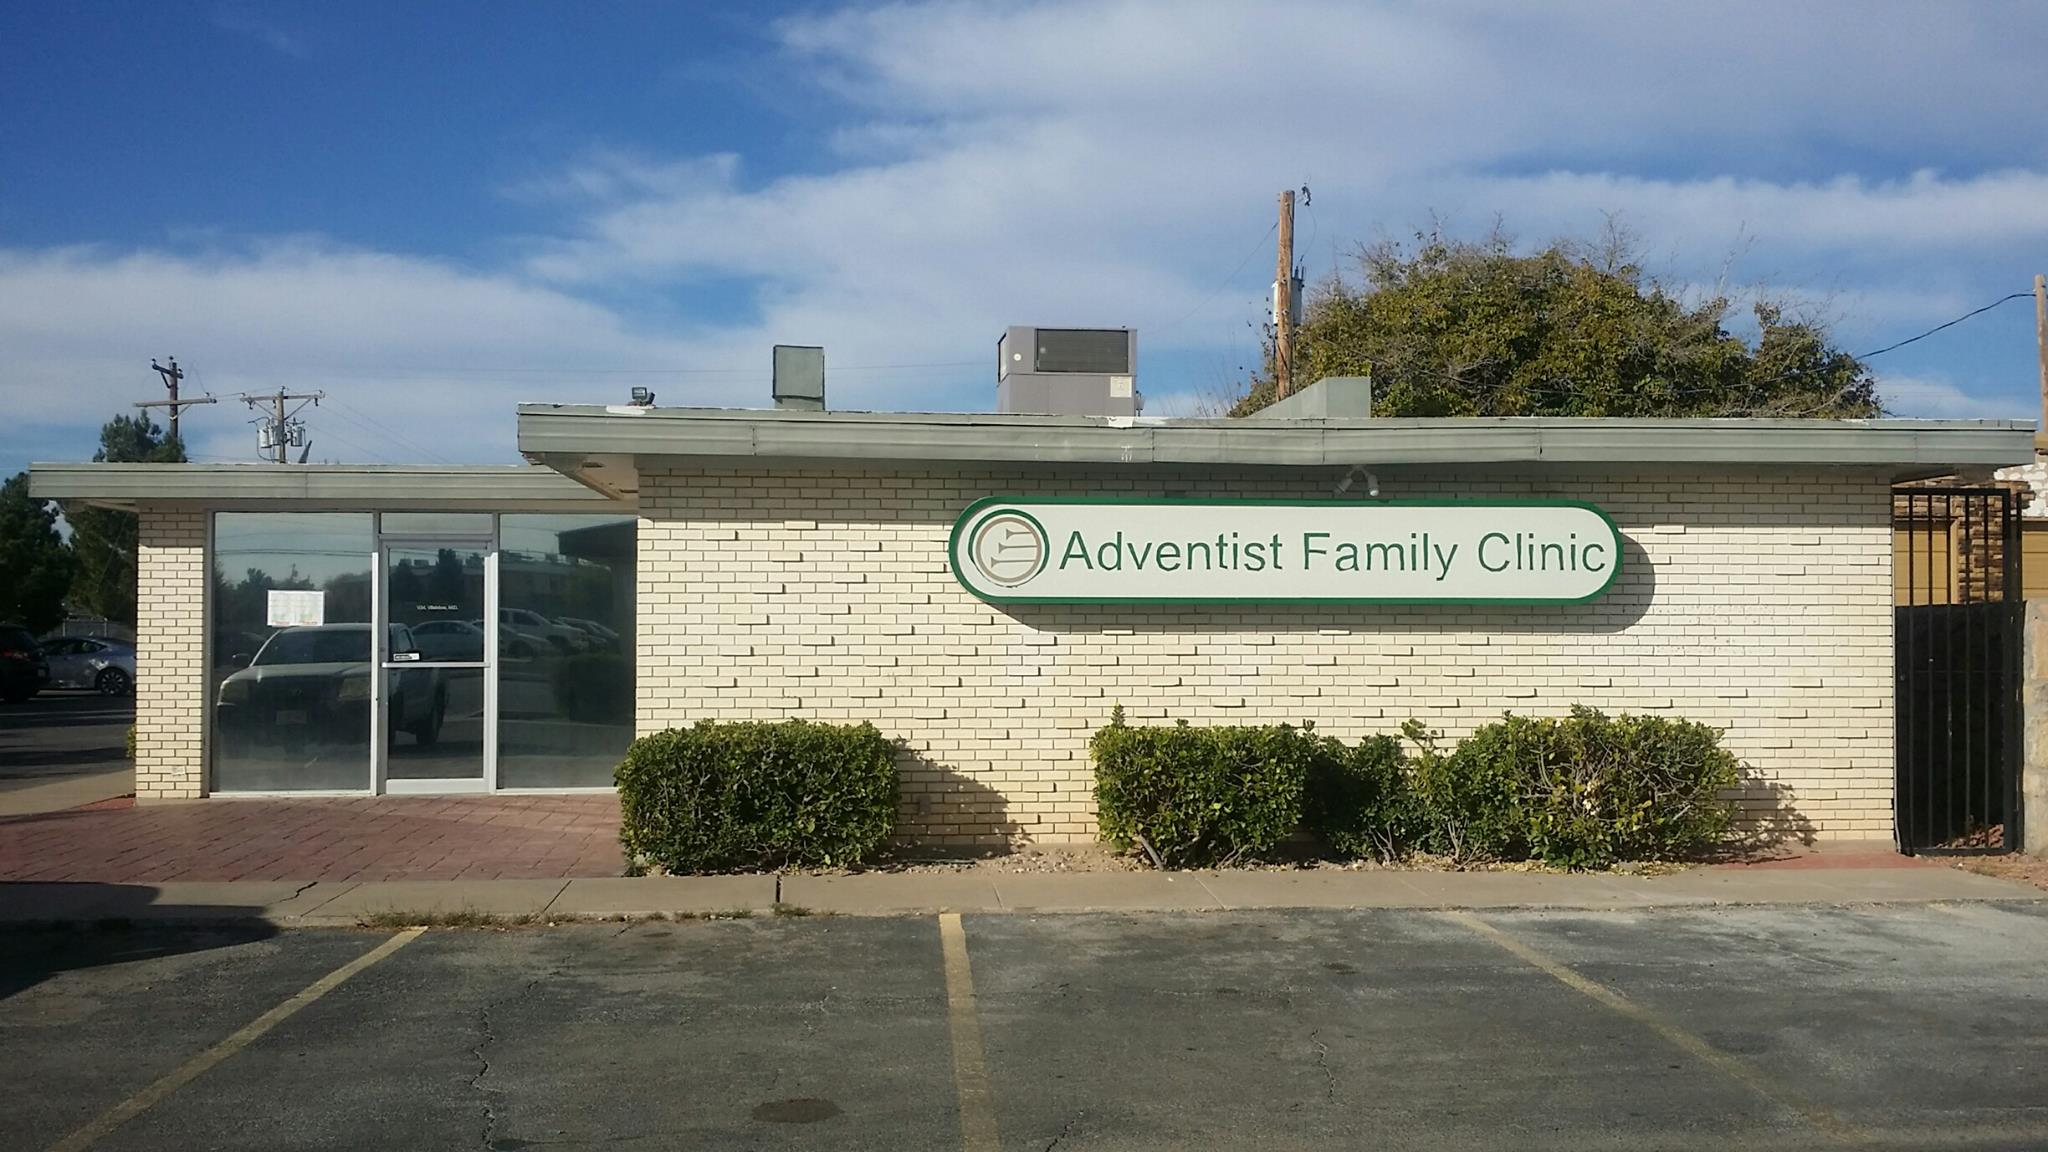 Adventist Family Clinic